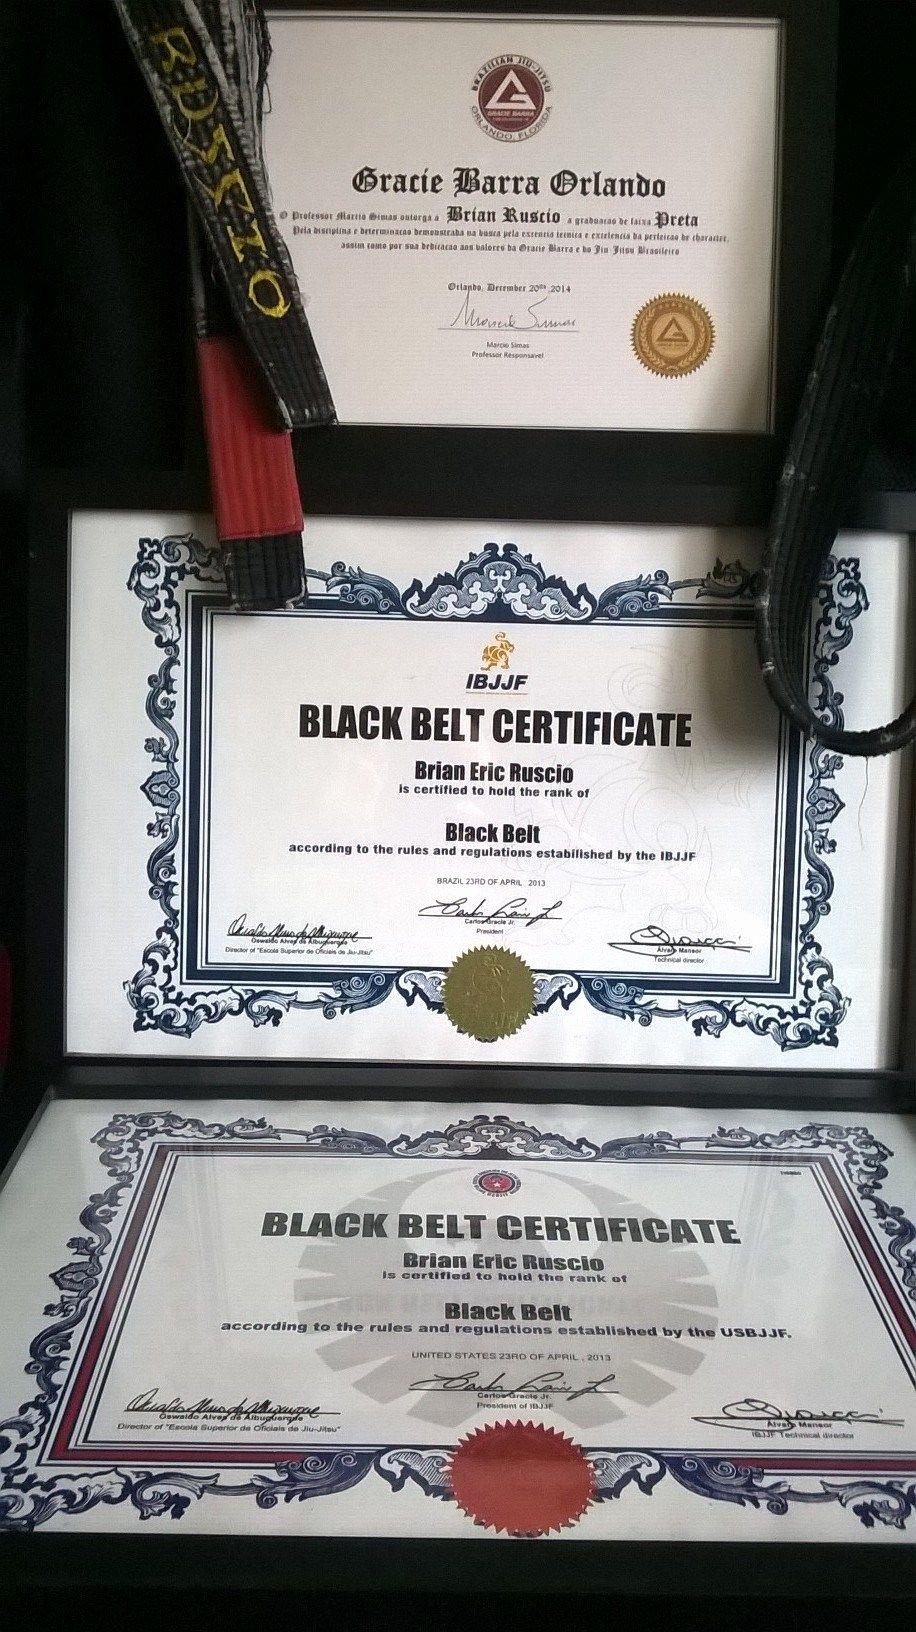 Karate Certificate Templates Free Download Unique Gracie Barra Black Belt Certificate